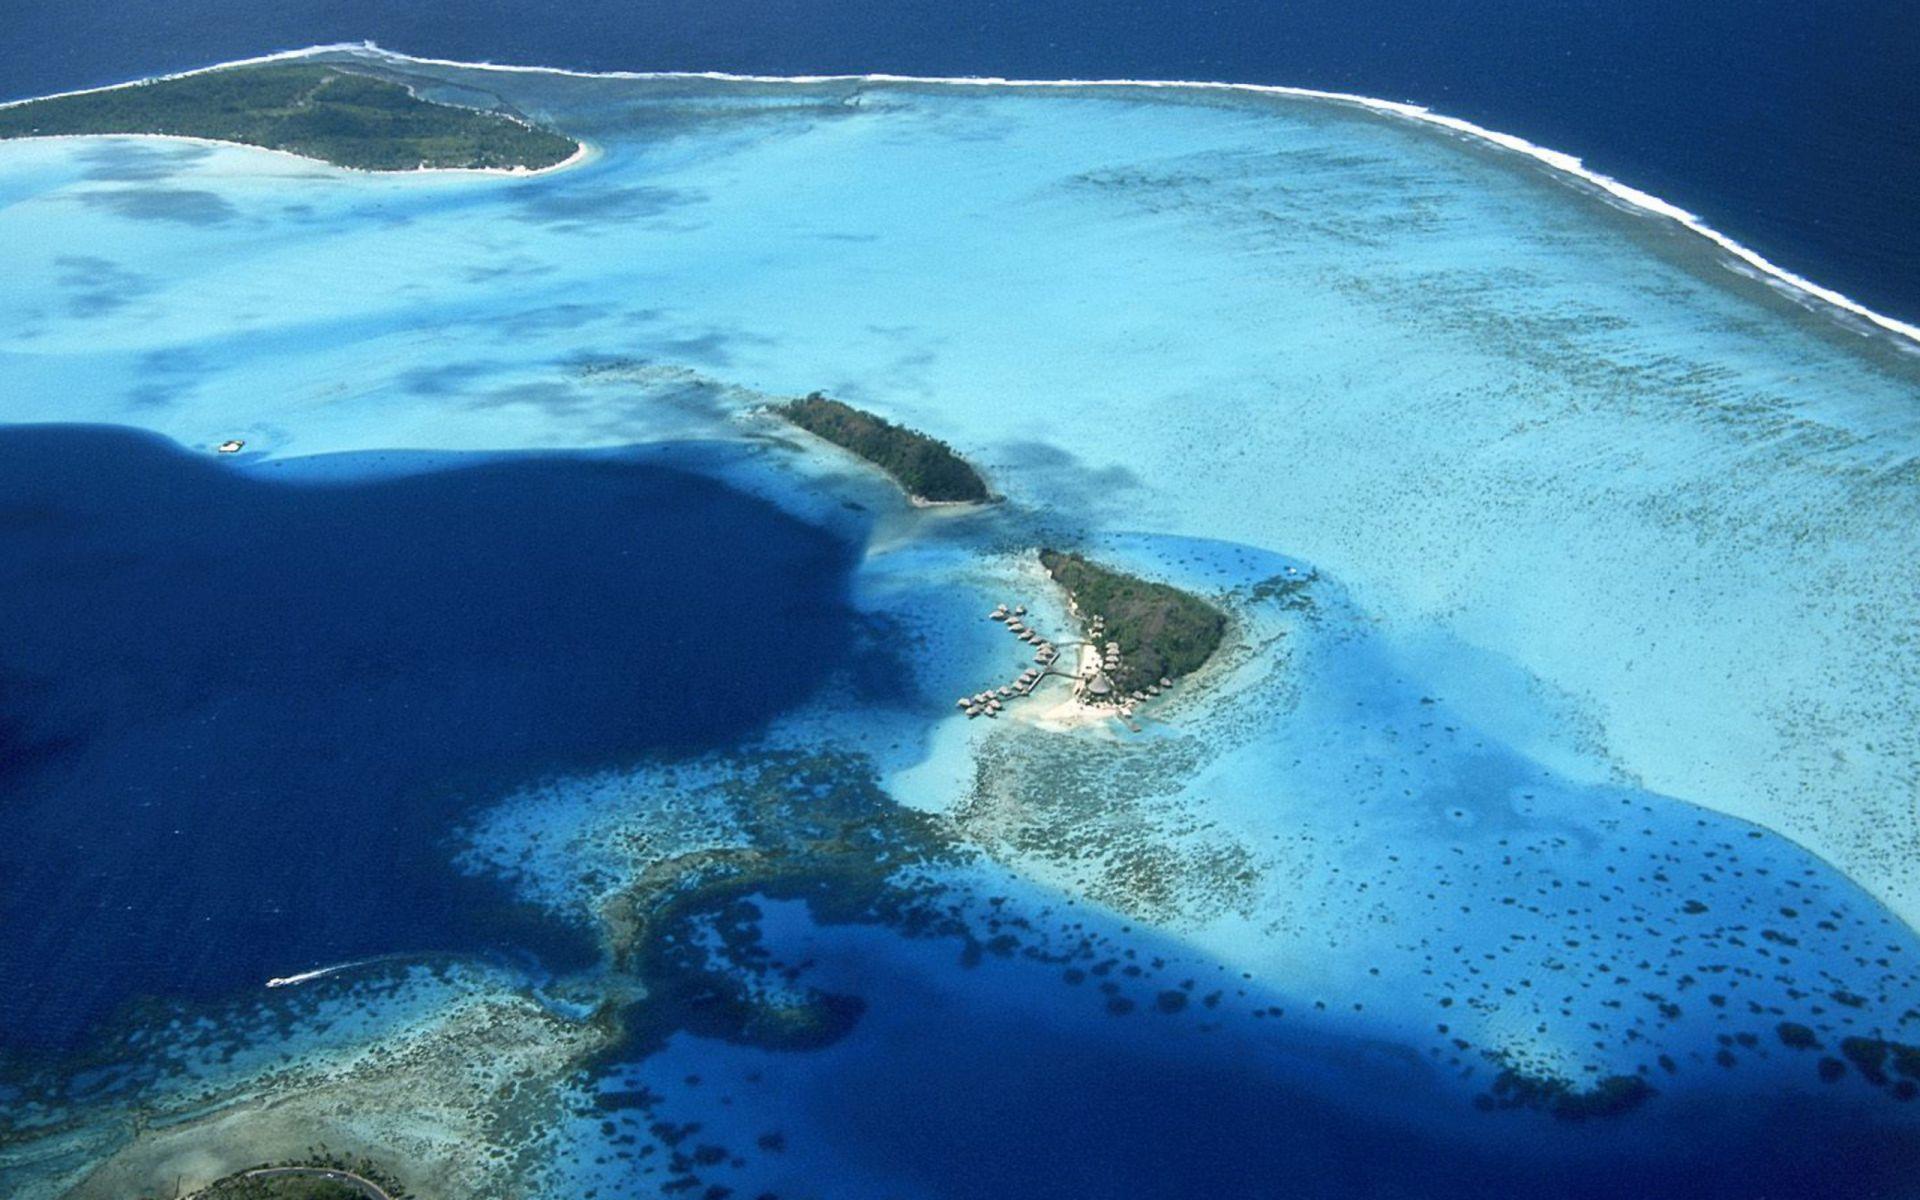 coral-reefs-hd-wallpaper-02